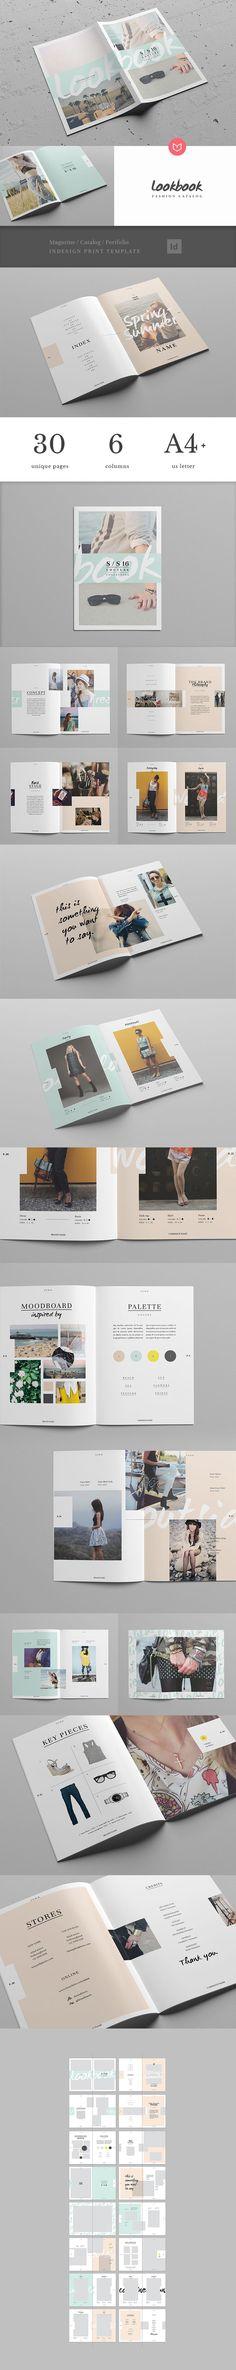 Lookbook Catalog Template on Behance